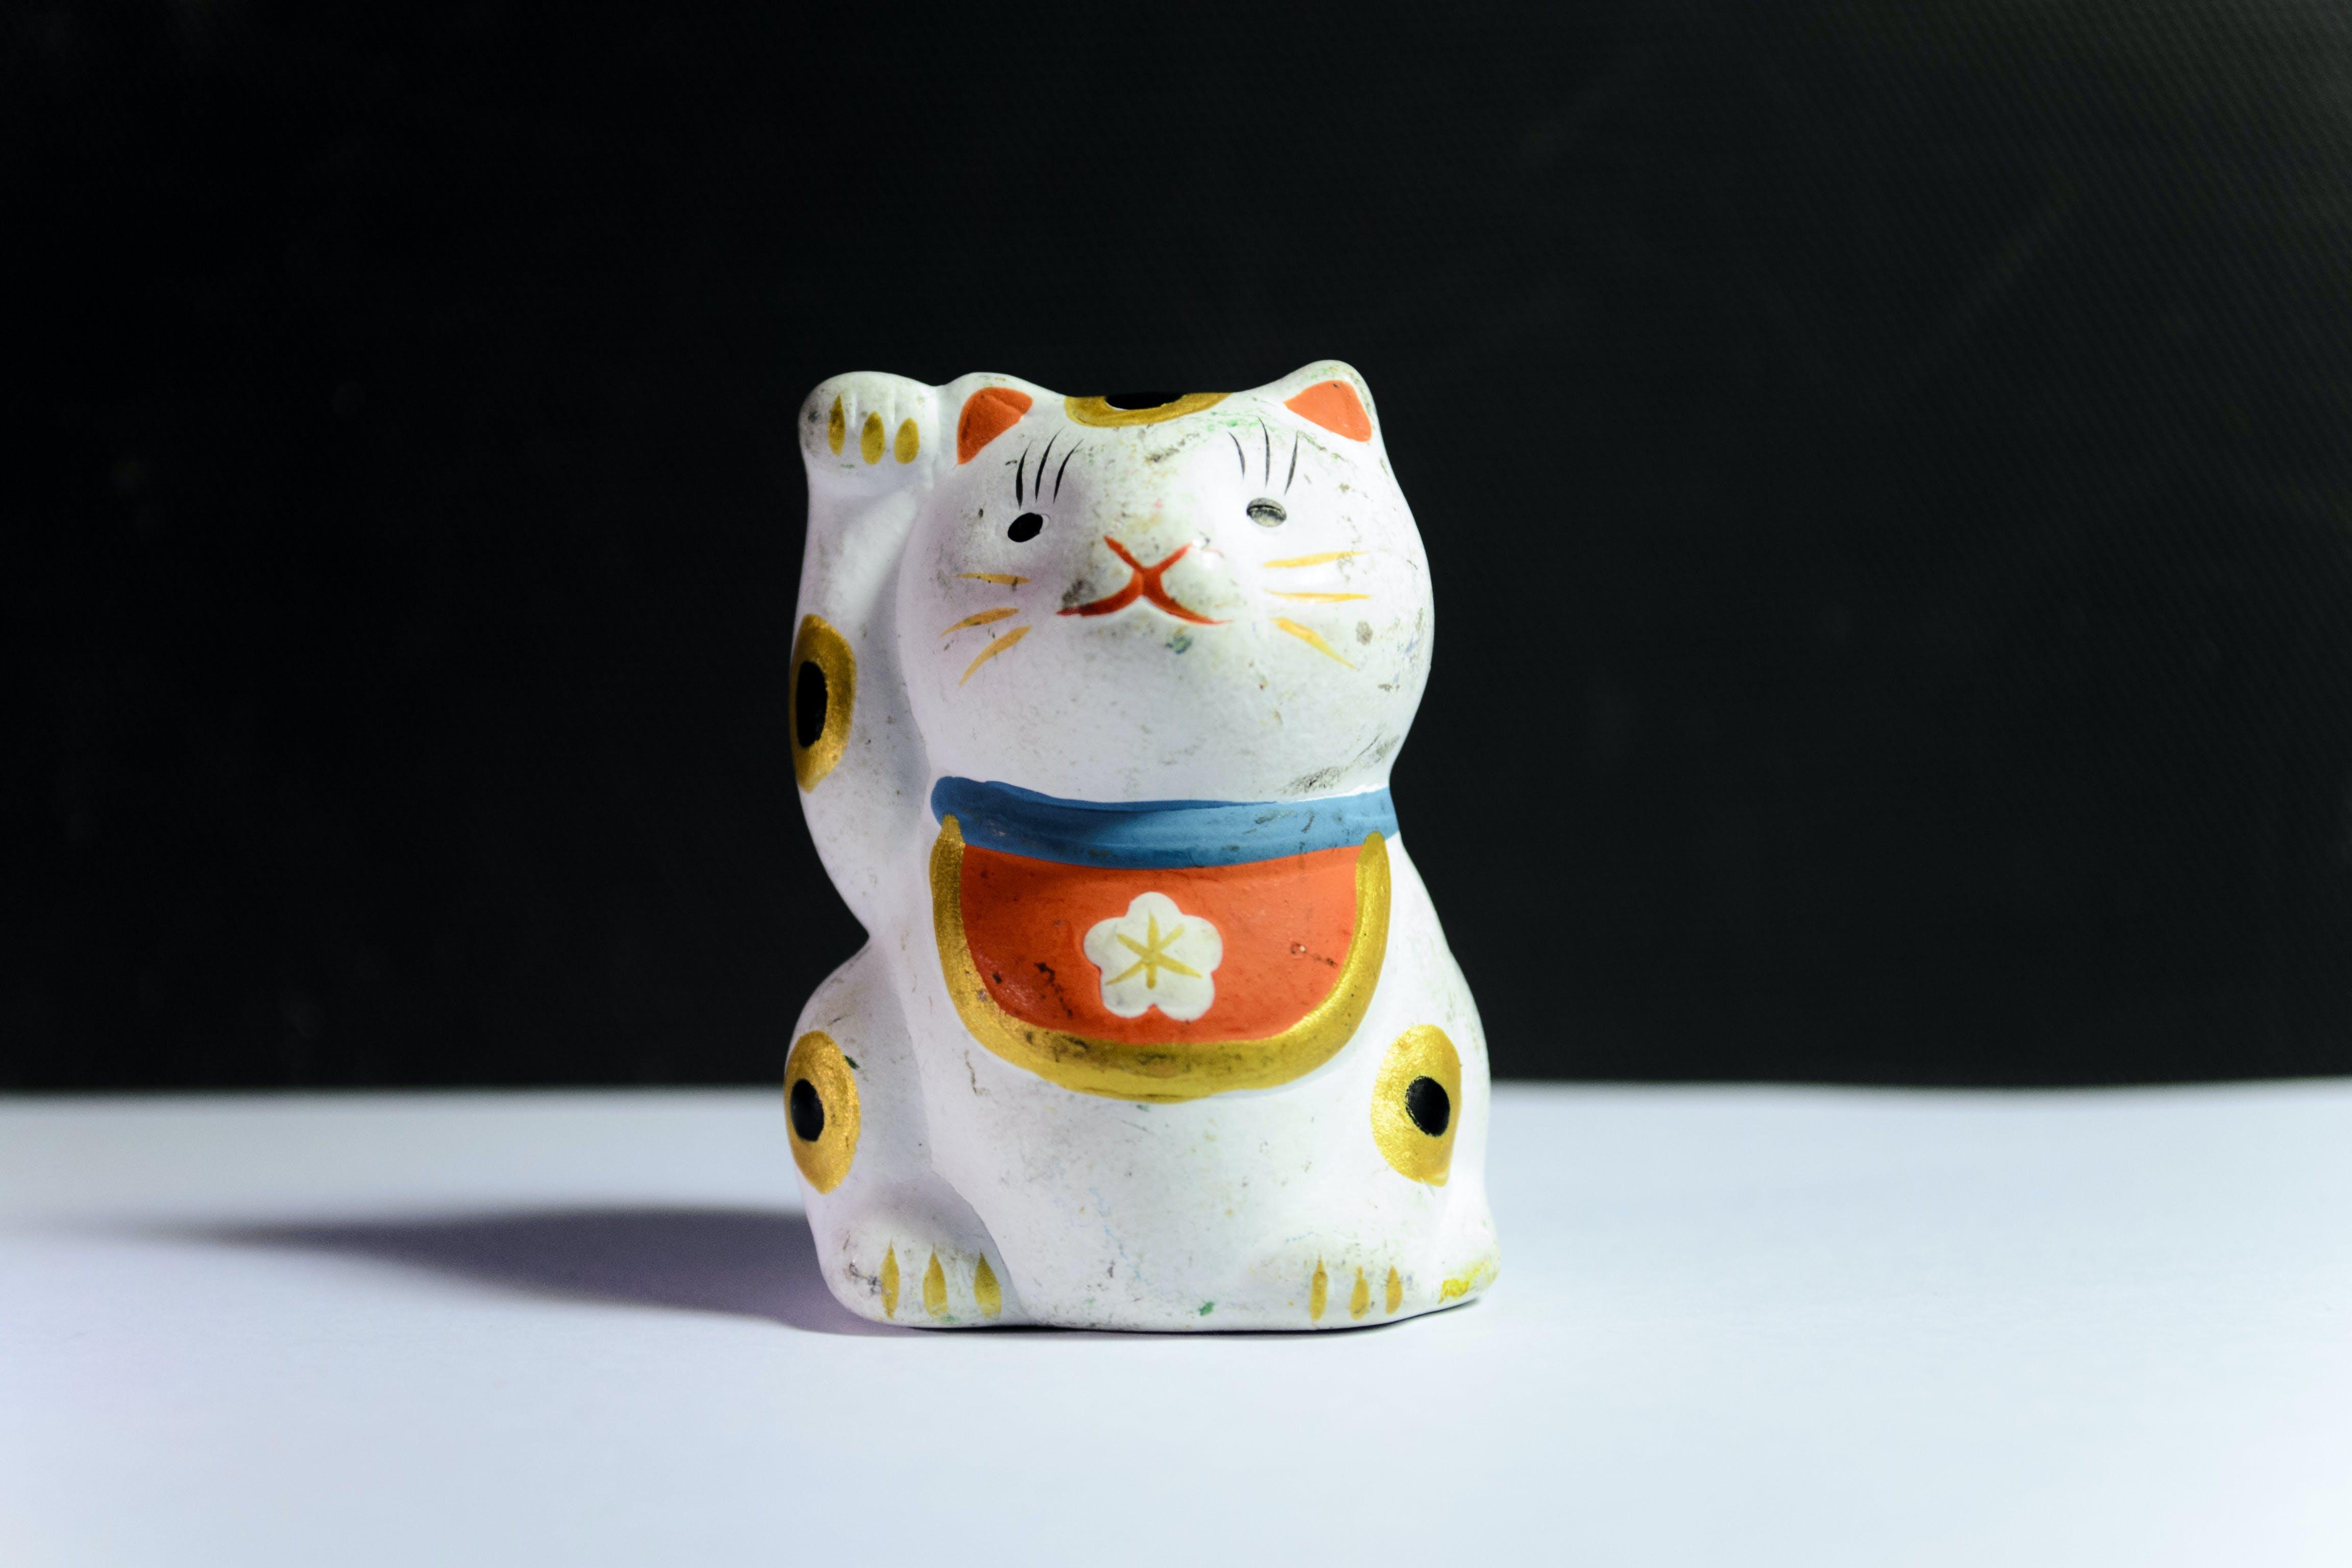 Maneki-Neko Figurine On White Surface